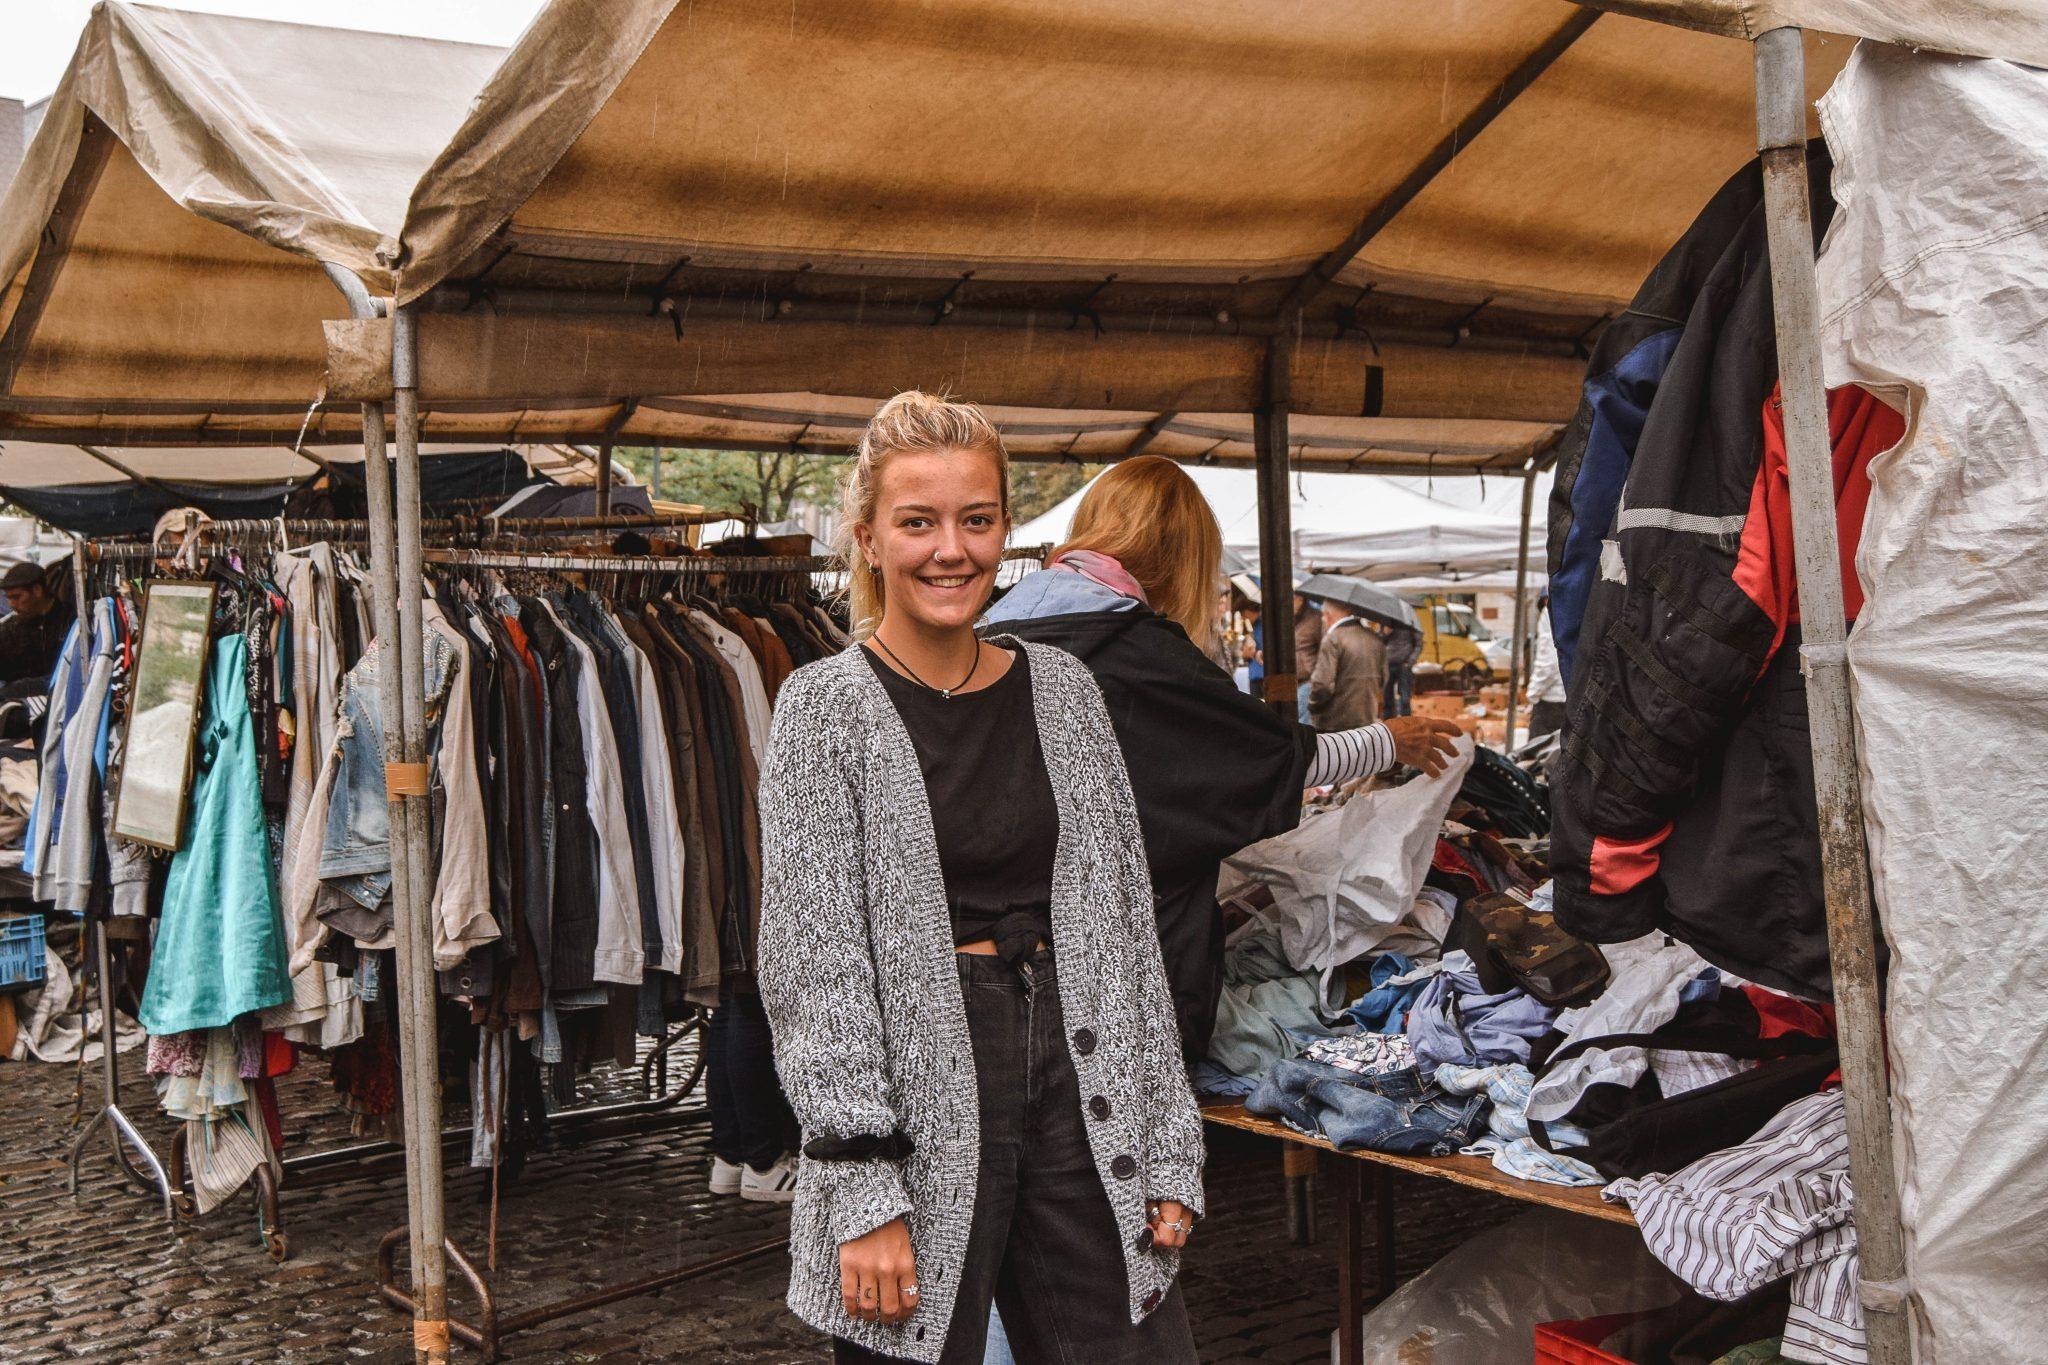 Wanderers & Warriors - Charlie & Lauren UK Travel Couple - Things To Do In Brussels In A Weekend - Marolles Flea Market Brussels